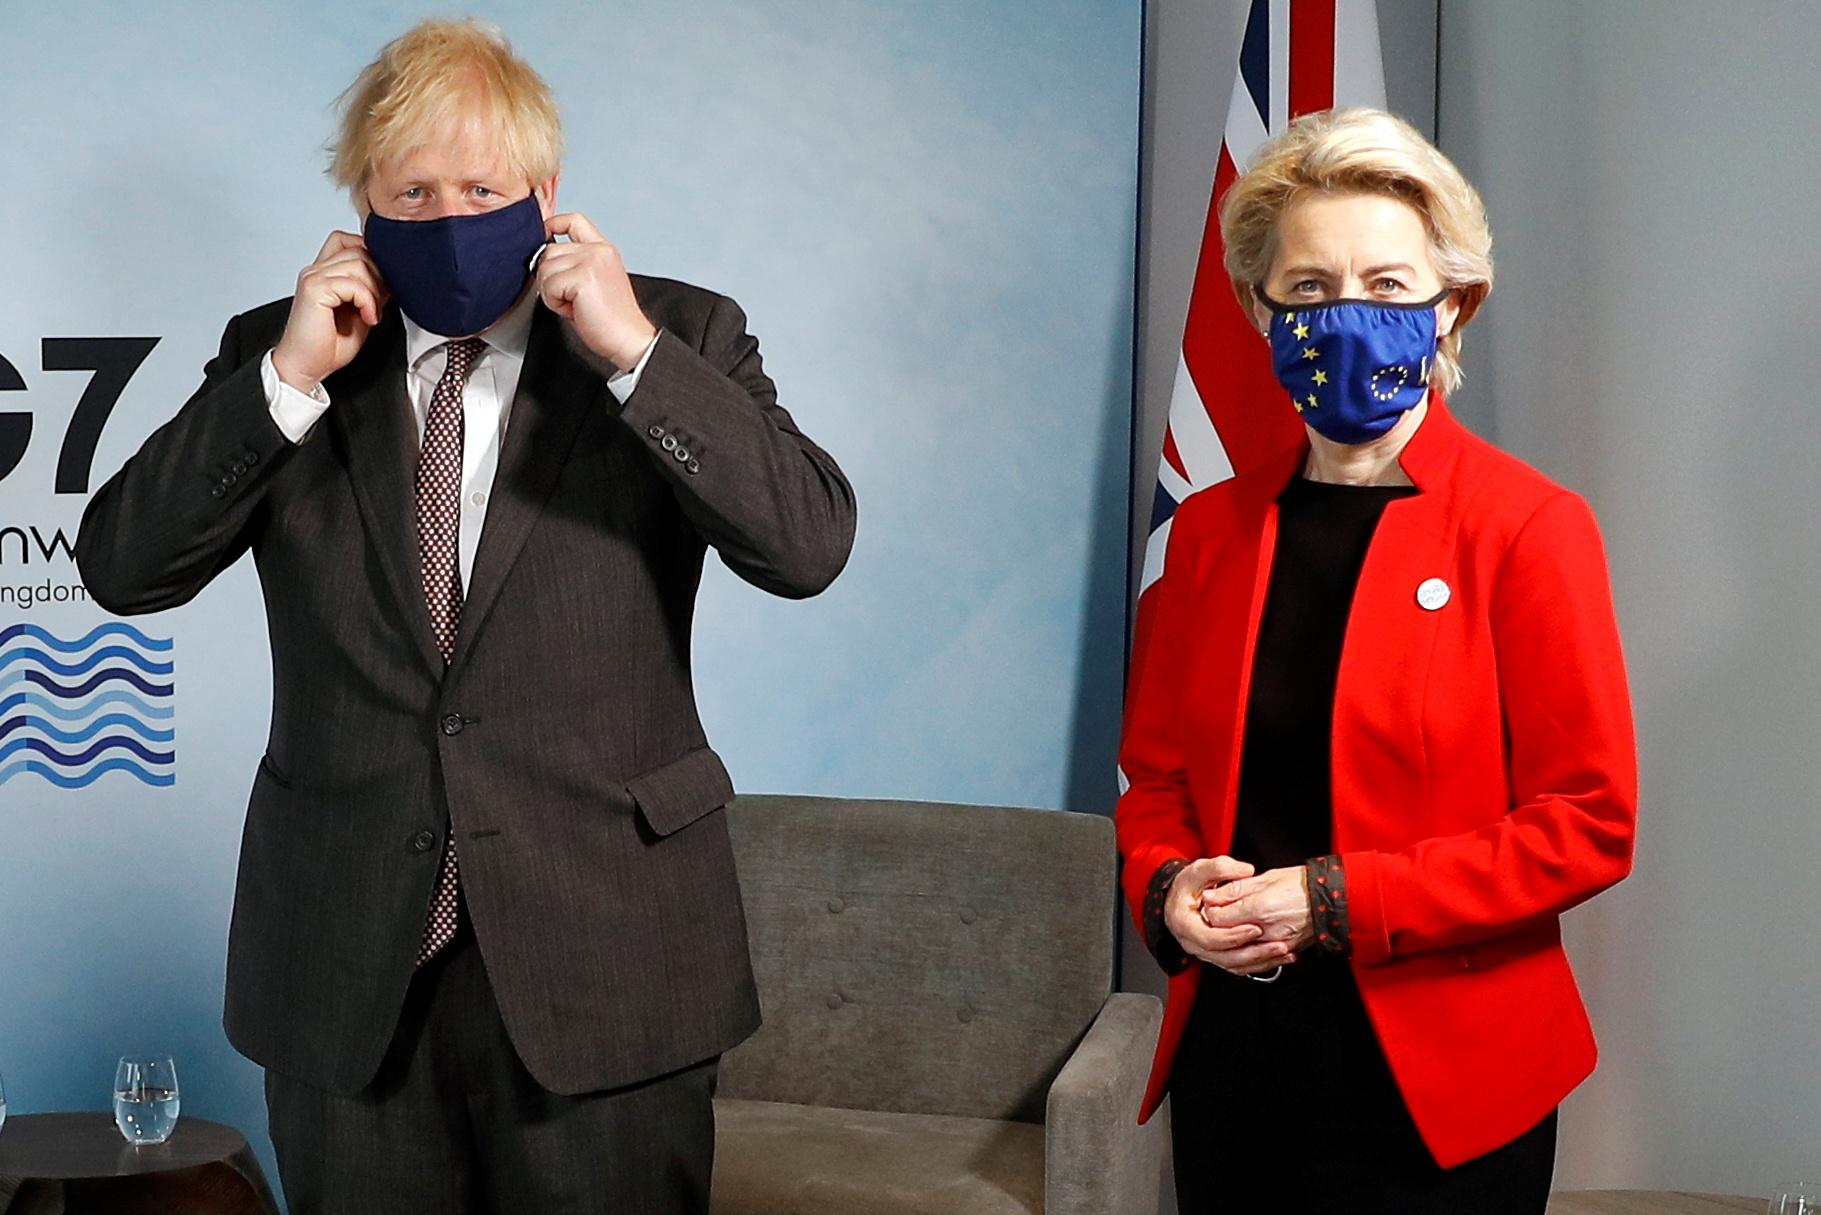 Brexit: Ο Τζόνσον καλεί την φον ντερ Λάιεν να «ξεπεράσουν το αδιέξοδο» με την Βόρεια Ιρλανδία